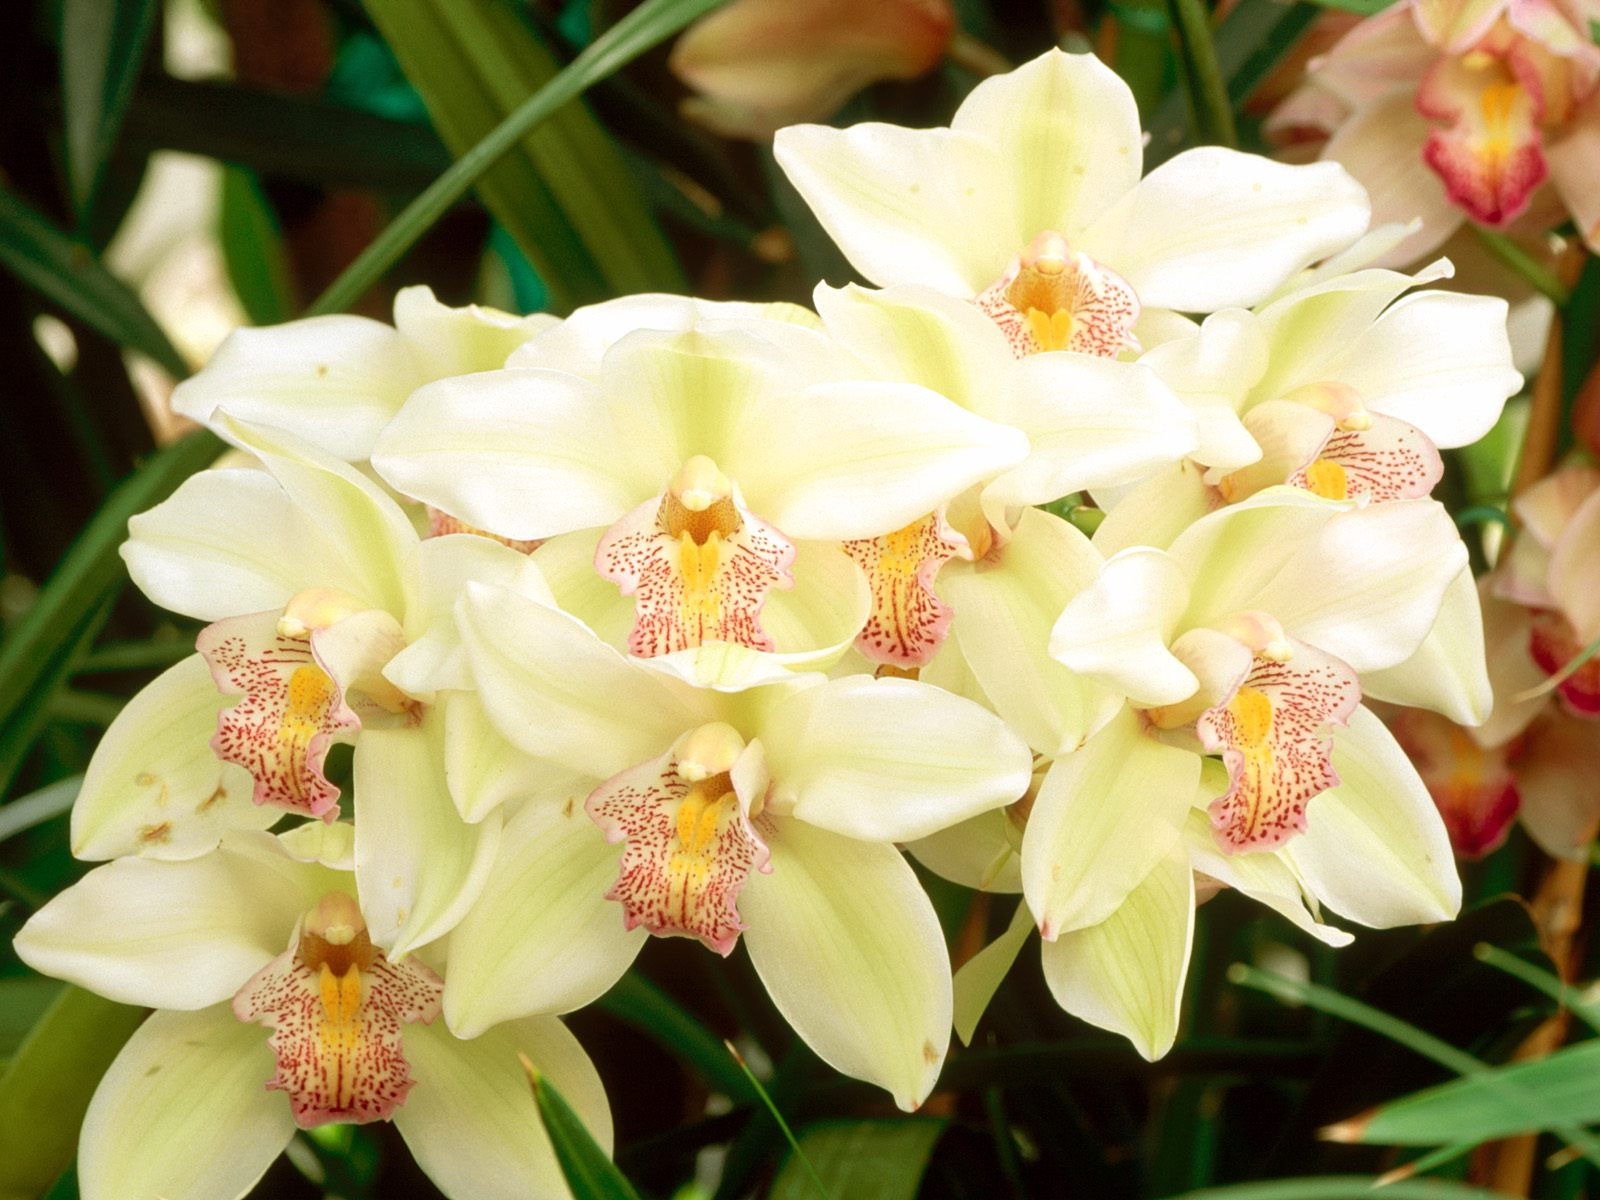 http://2.bp.blogspot.com/-GS_uZ93kKBQ/Tf9_DhW82qI/AAAAAAAAAVM/Q4W0_0fRixU/s1600/Cymbidium+Orchids+Flowers+Wallpapers+3.jpg